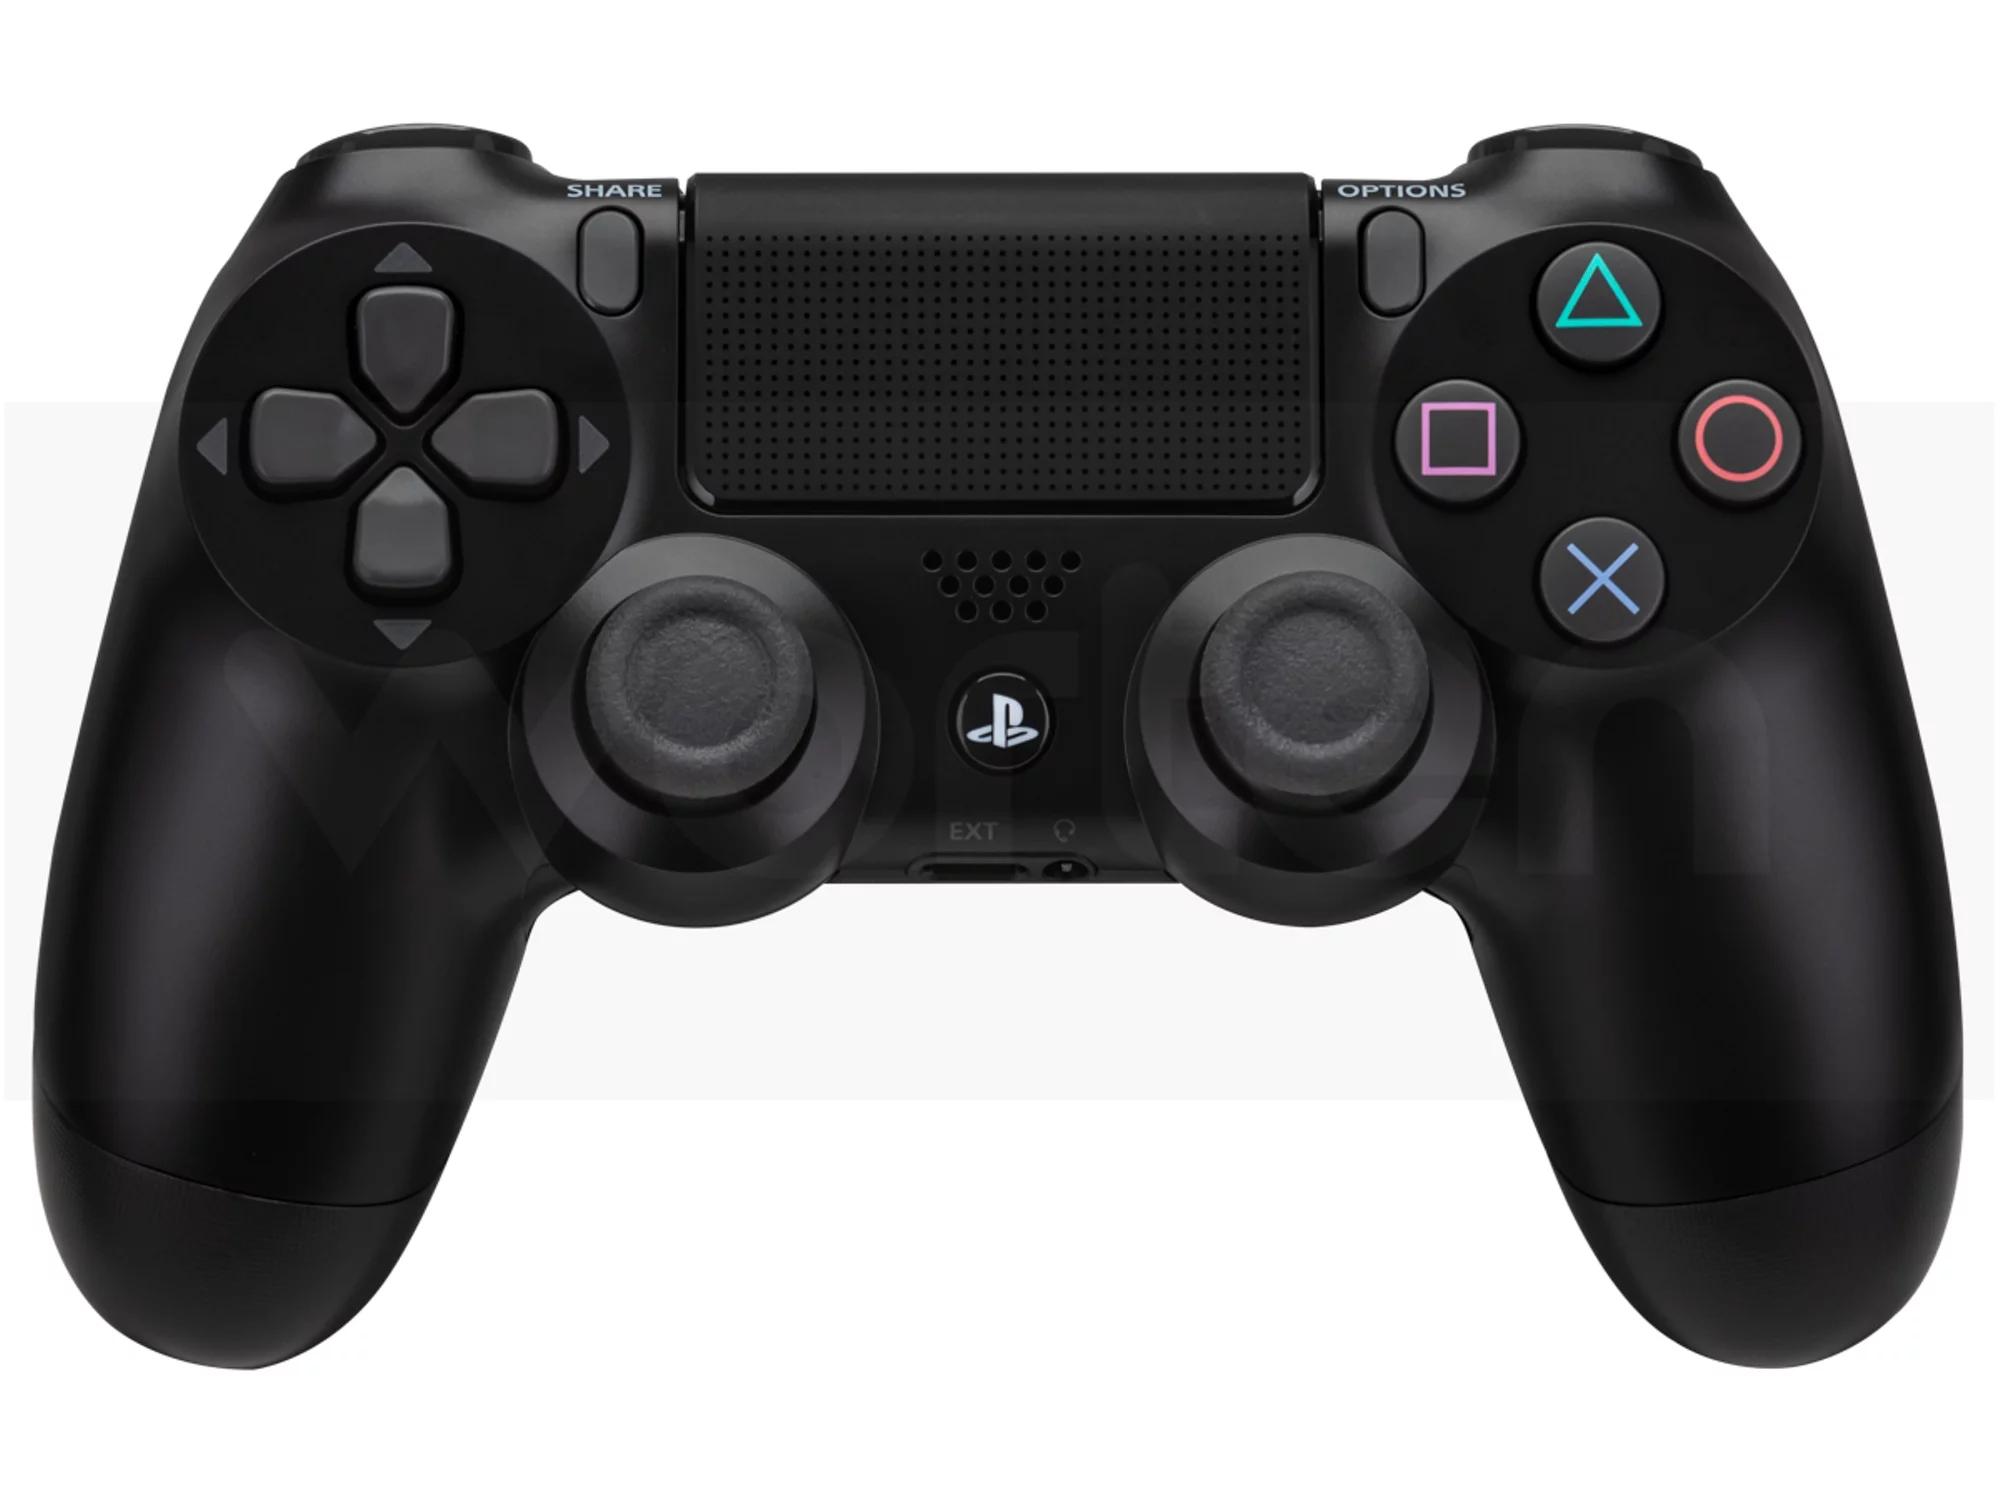 Mando PS4 Dualshock Black V2 Fortnite Voucher